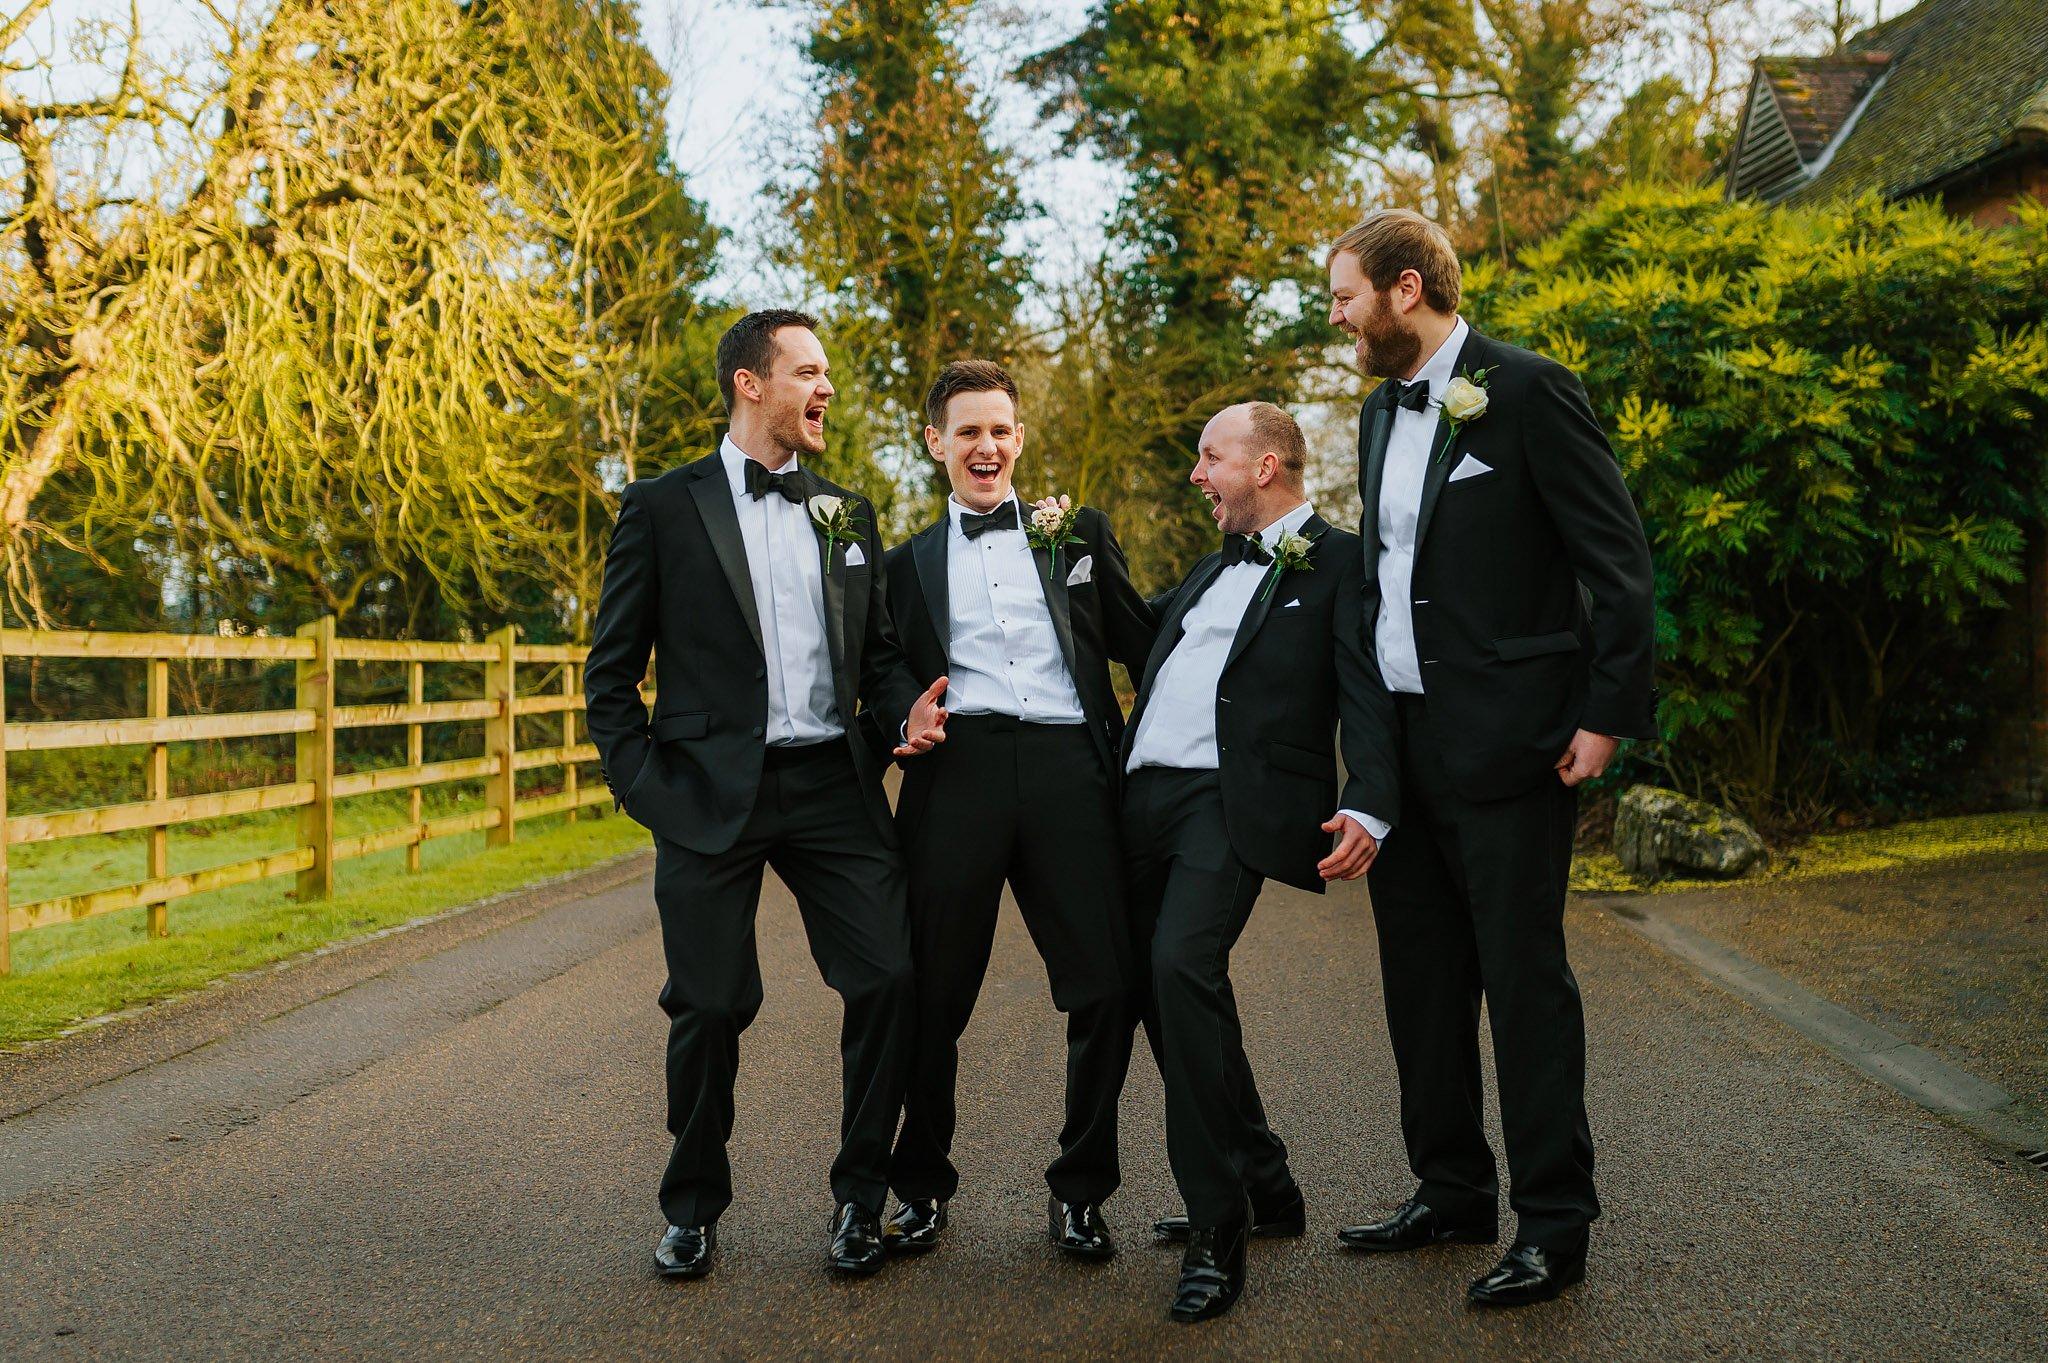 Coombe Abbey wedding in Coventry, Warwickshire - Sam + Matt 14